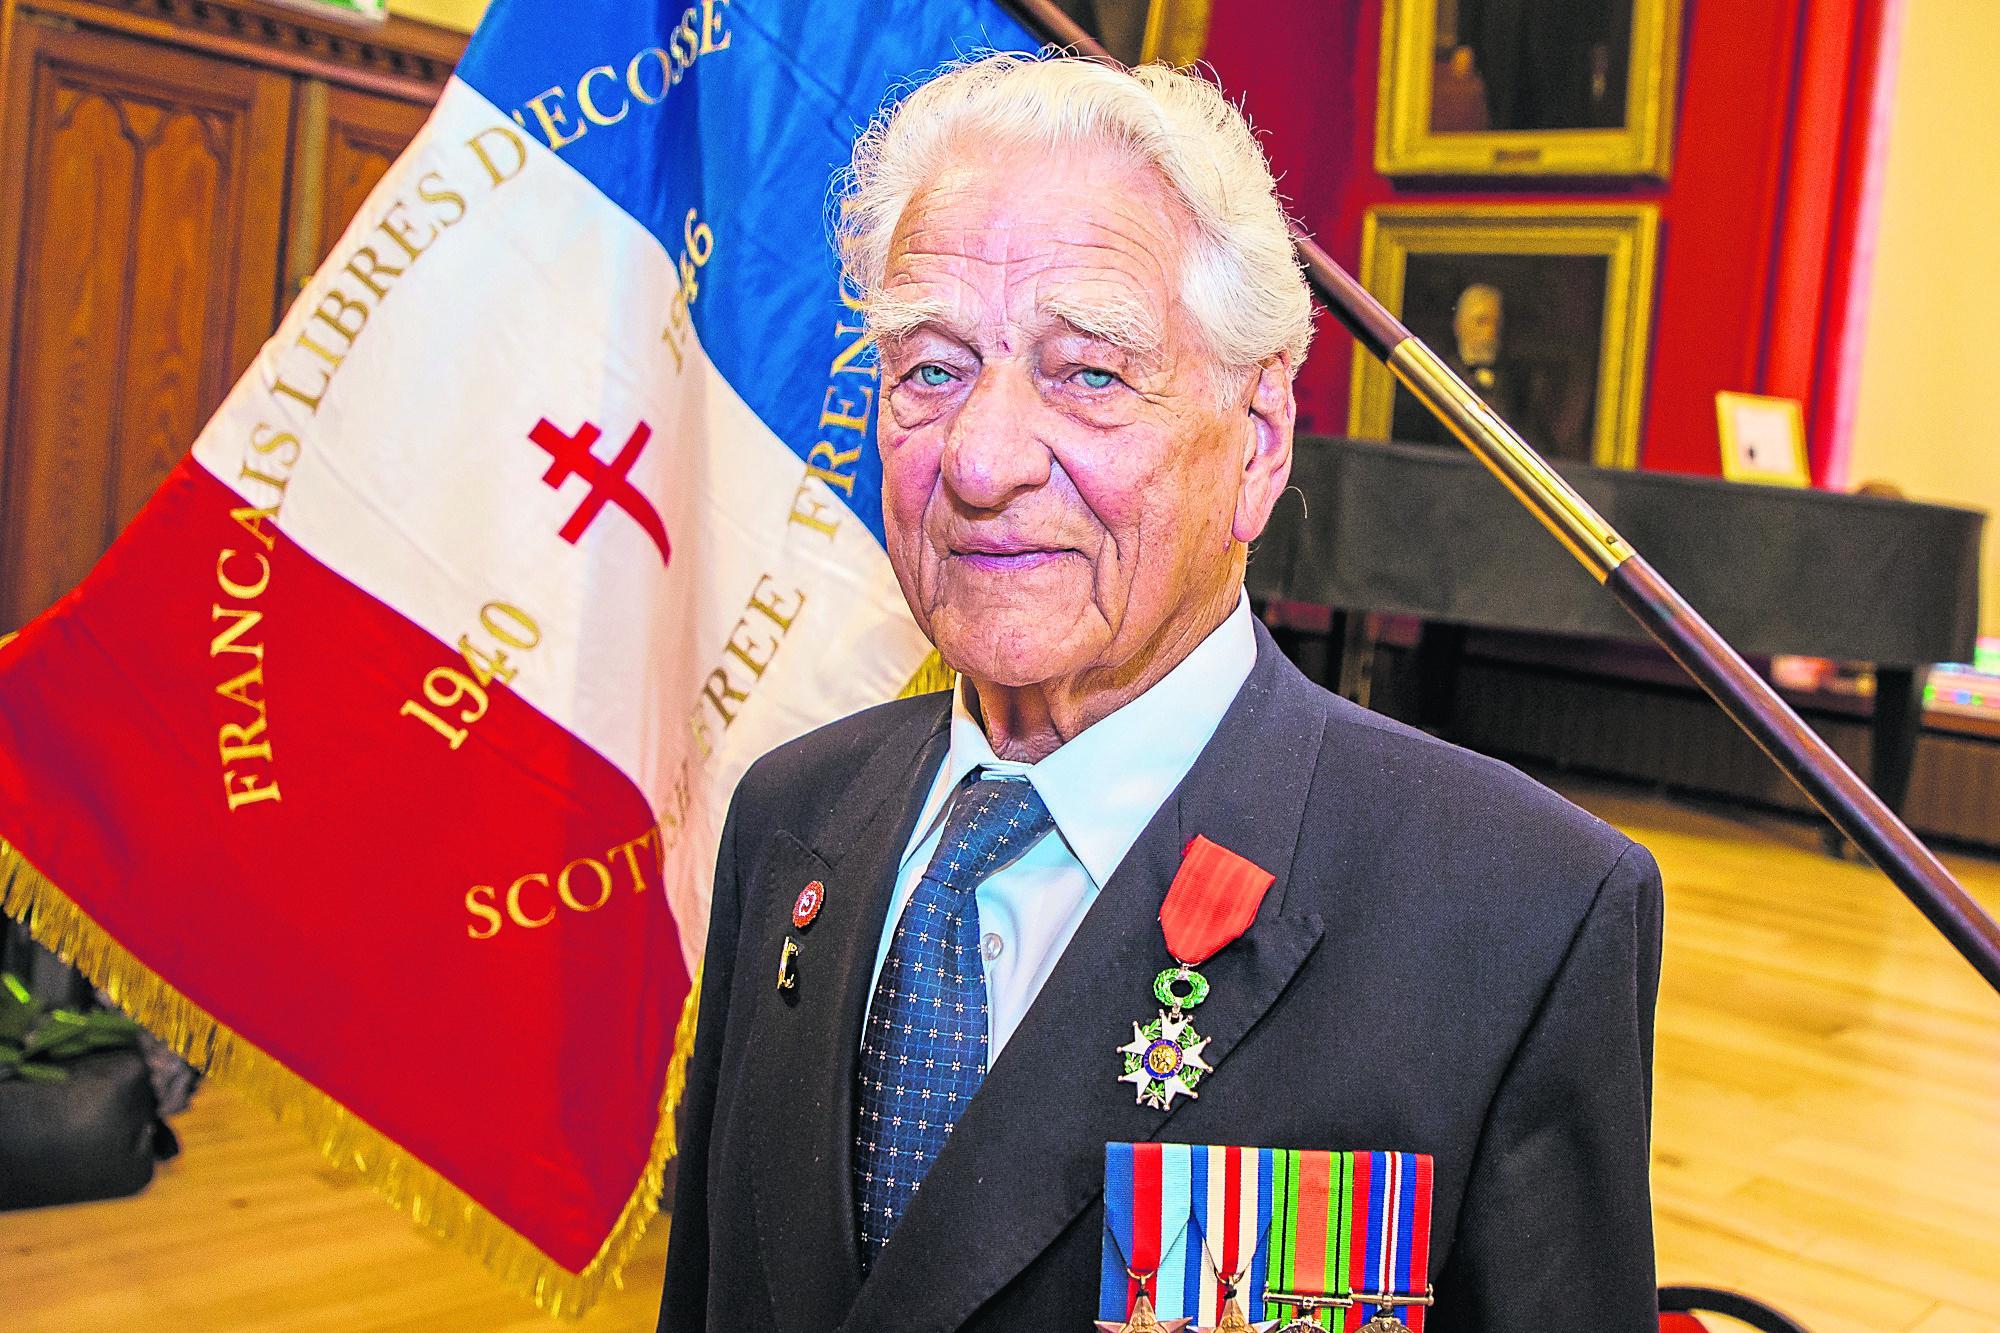 94 year old D-Day veteran, Ian MacLennan of Evanton is awarded the Légion d'honneur.